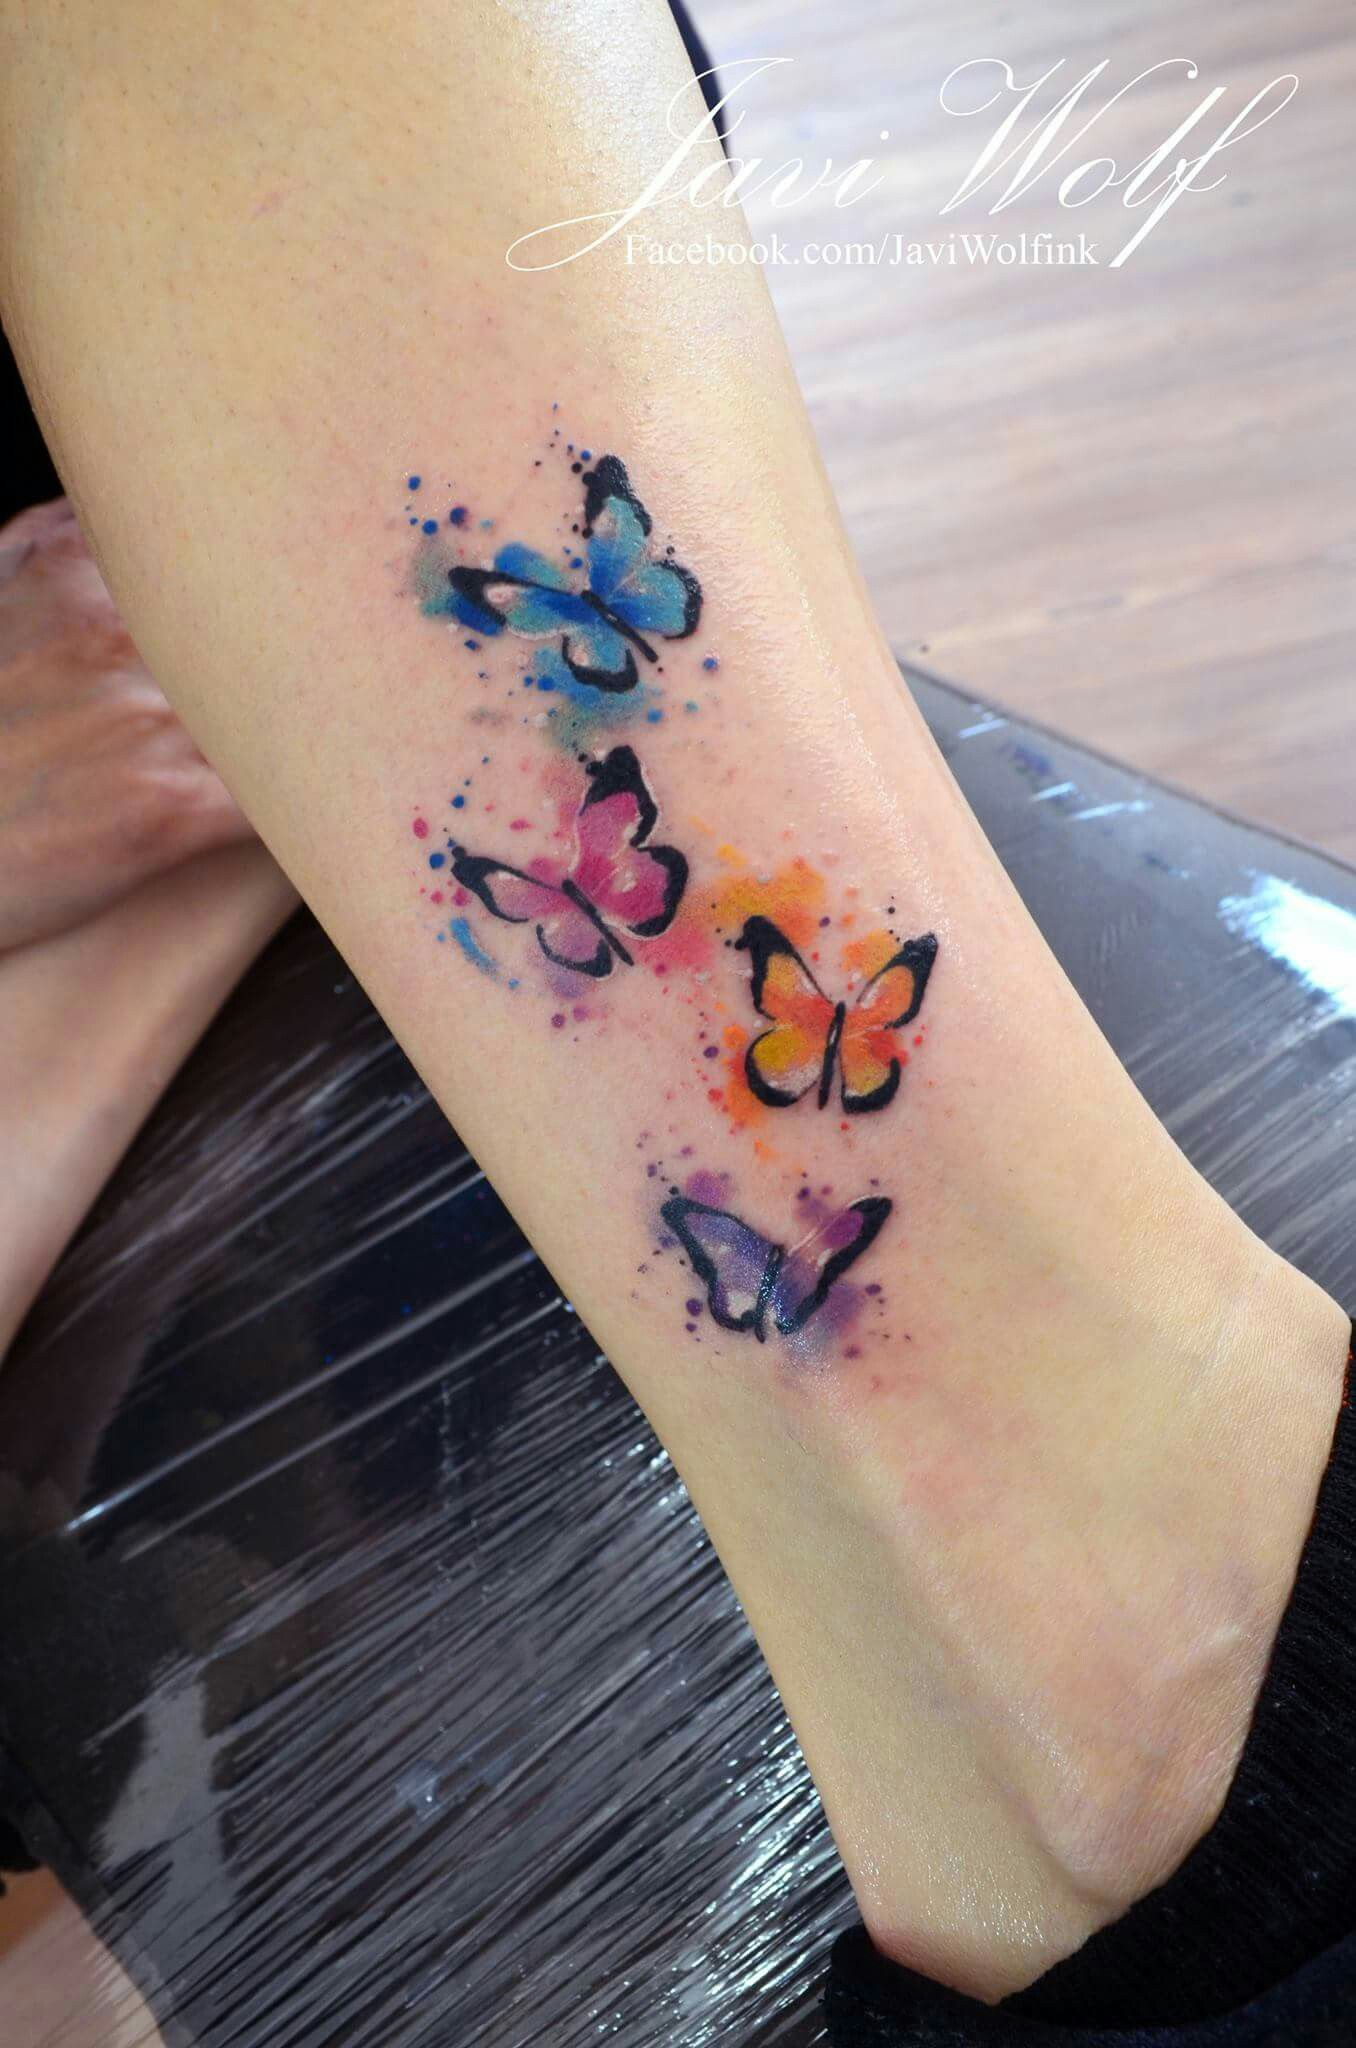 Javi wolf watercolor butterflies tattoo ideas pinterest